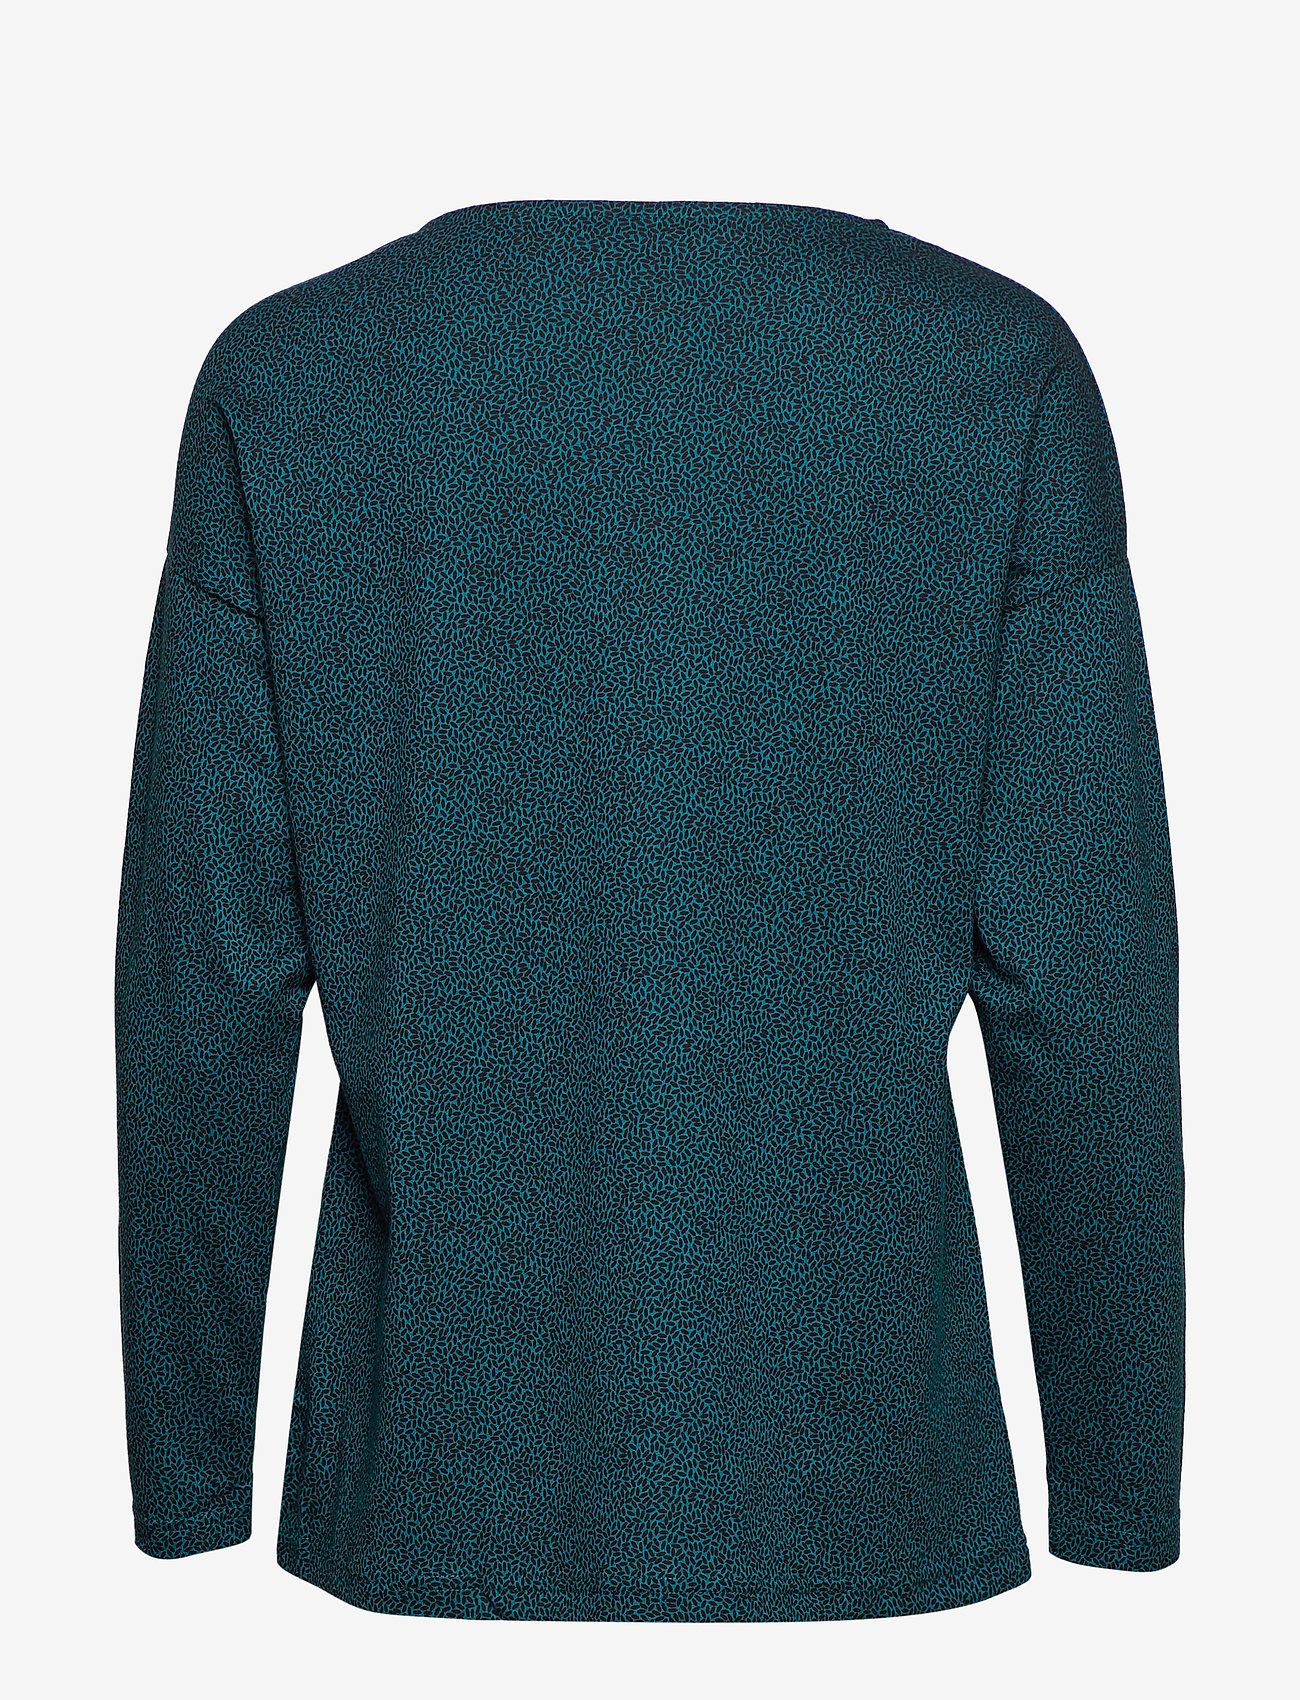 Nanso - Ladies blouse, Riisi - neulepuserot - petrol - 1